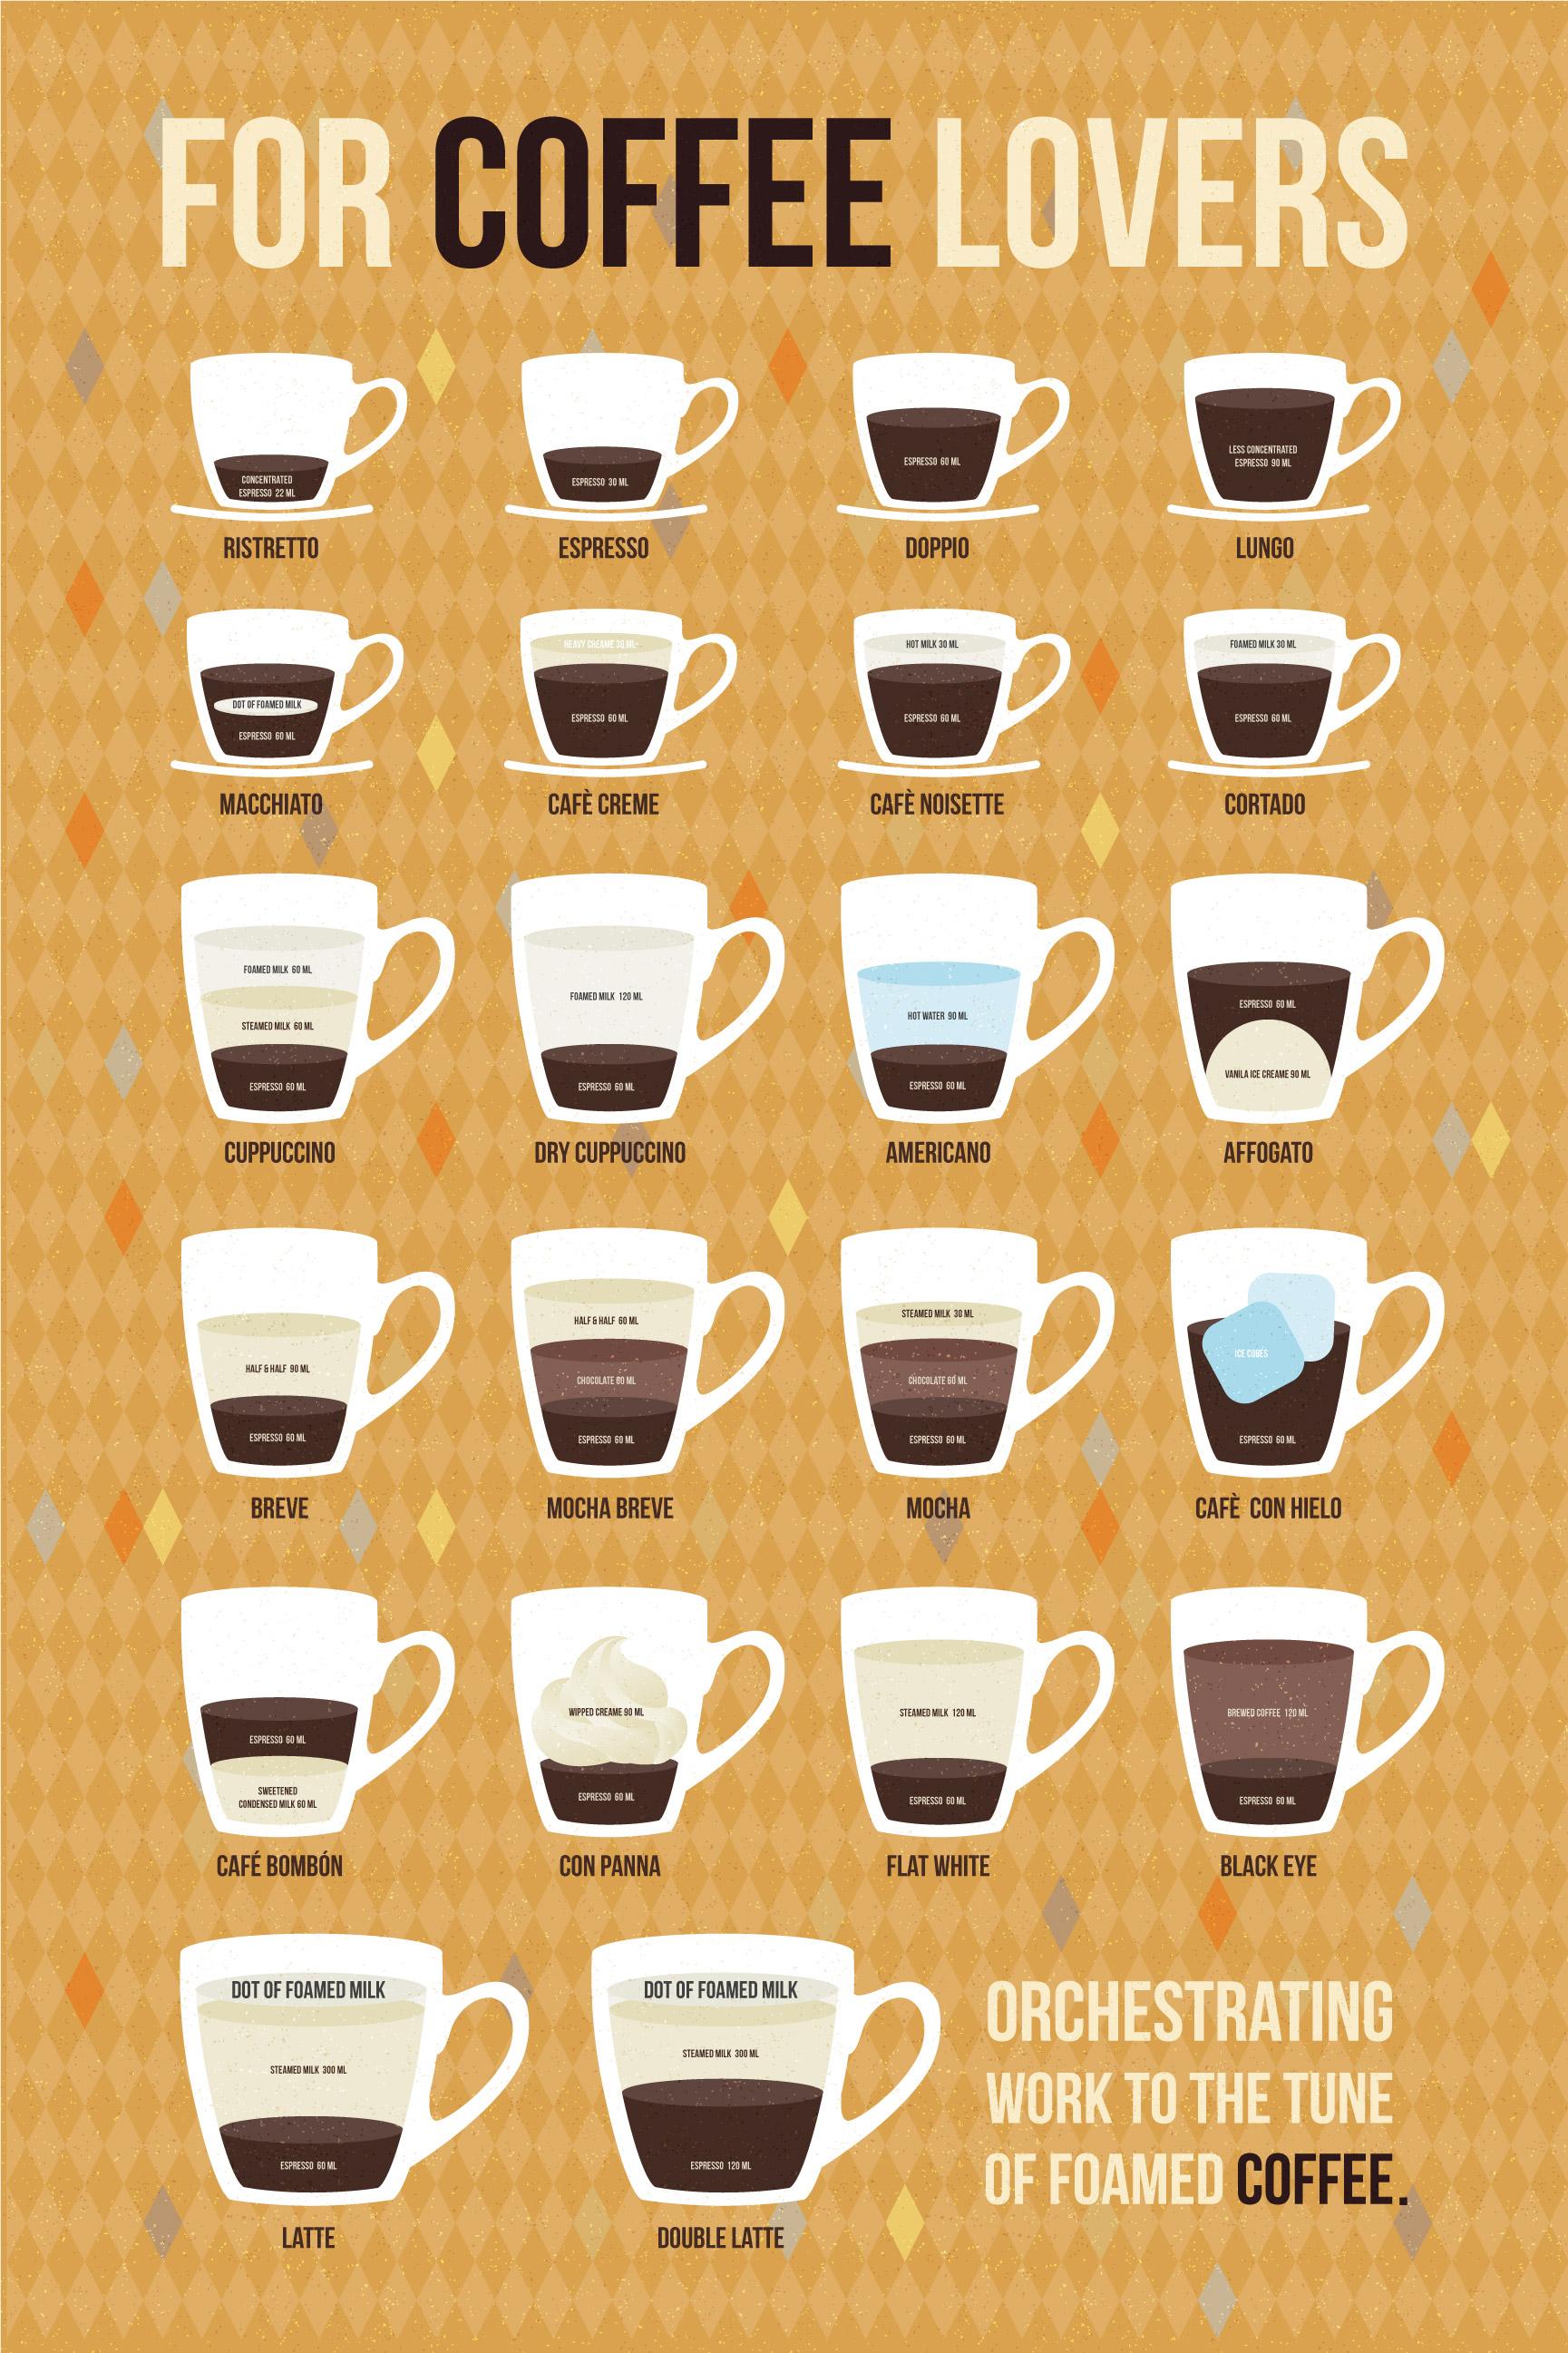 define latte